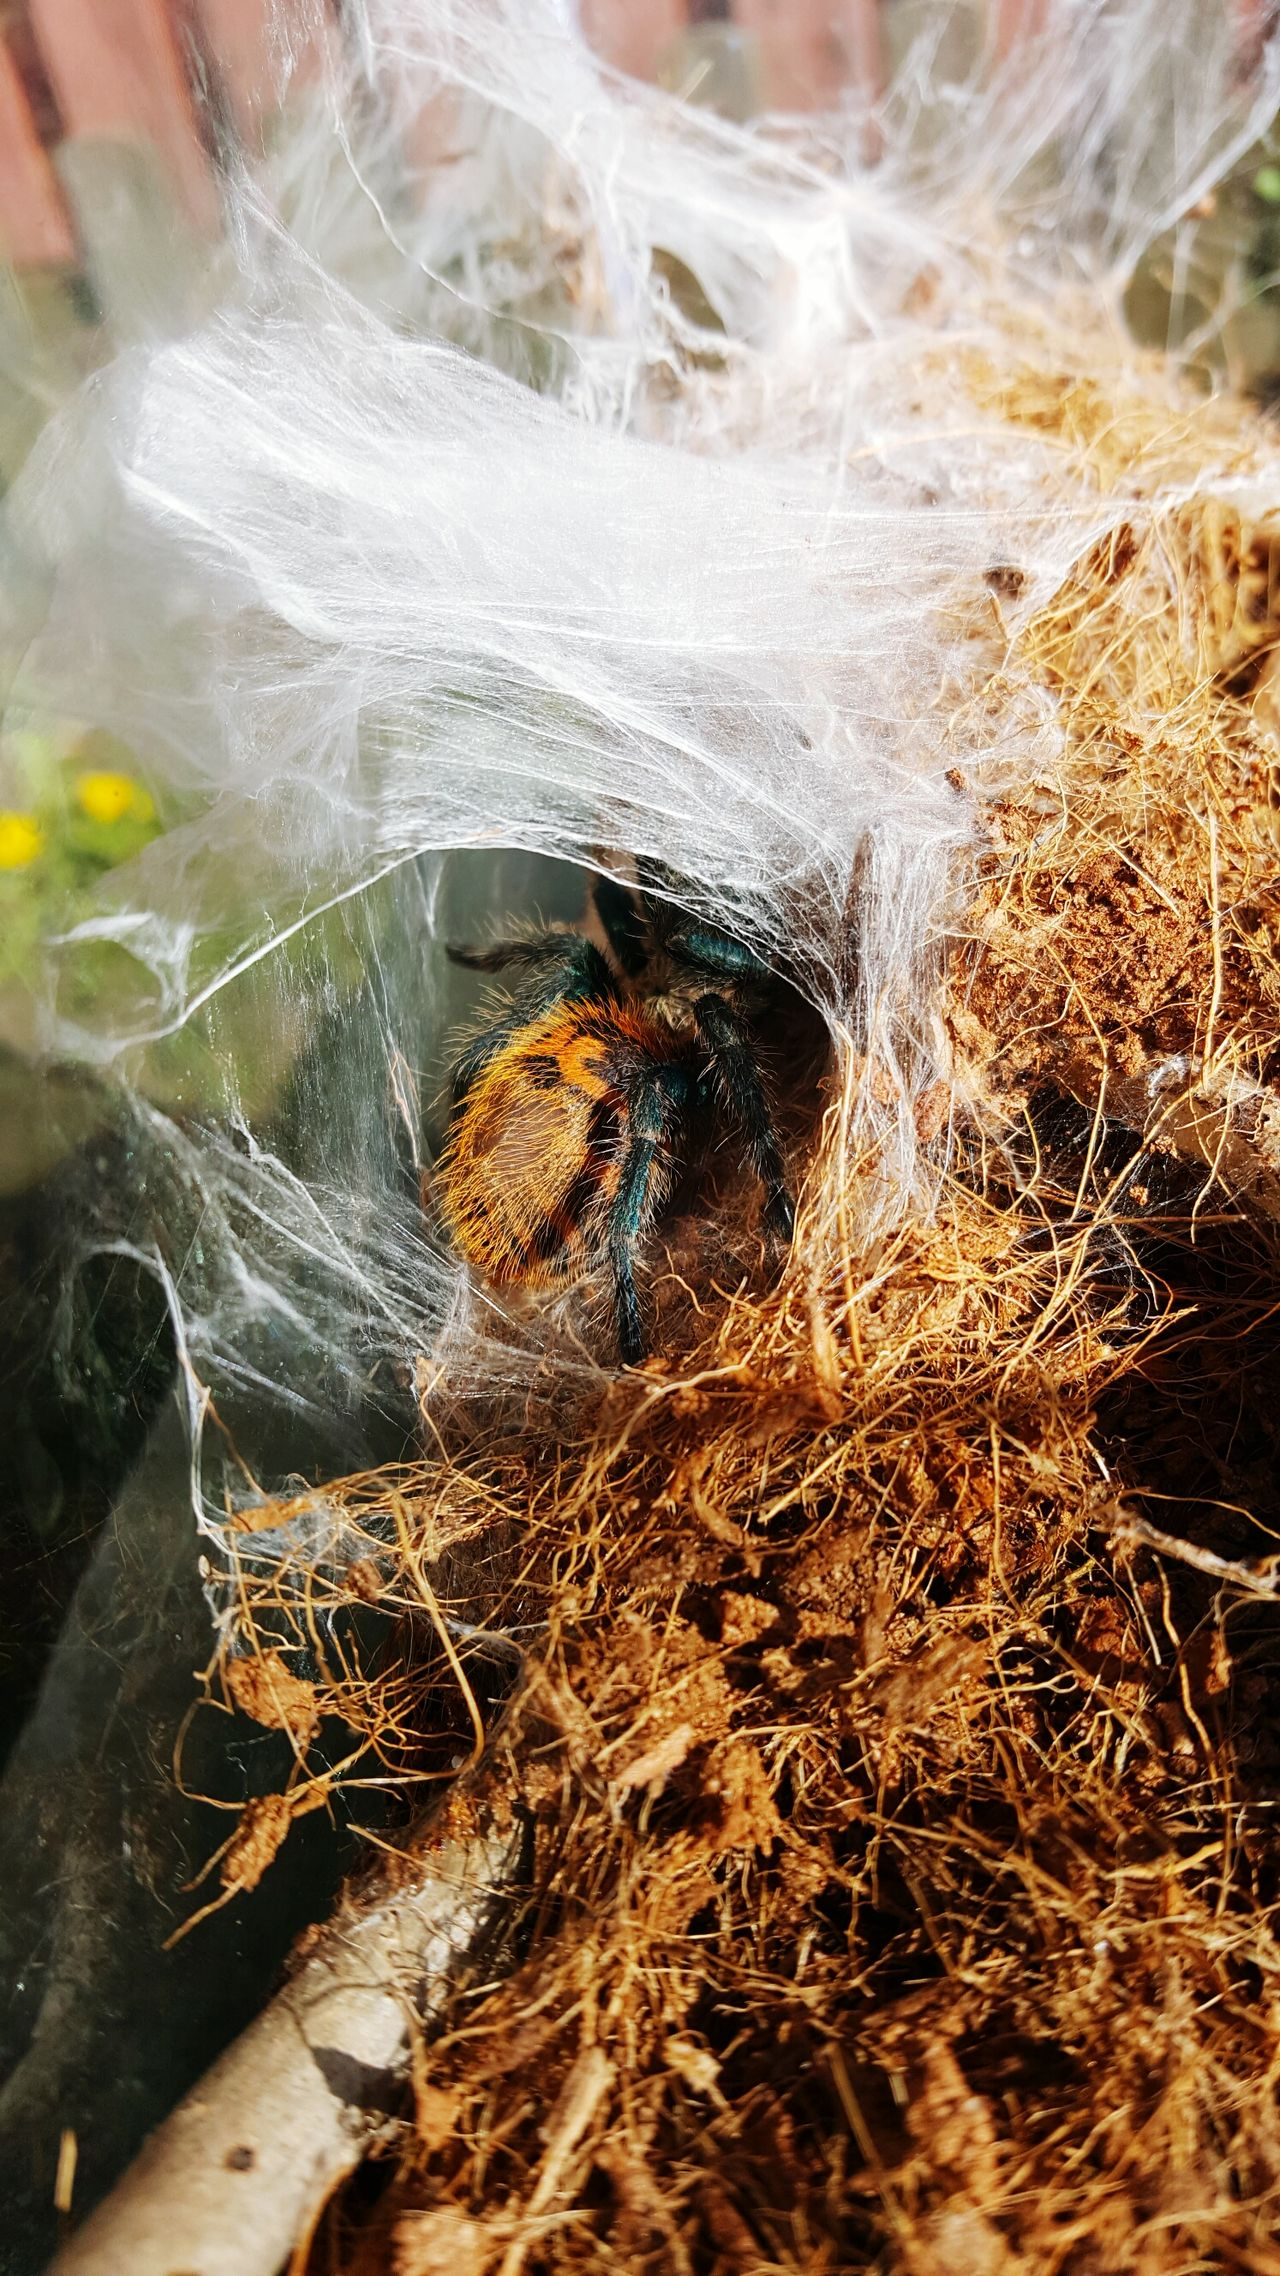 Tarantula Hiding From The World Spider Web Terarium Spider Jonis Animal Themes Bug Green Butle Blue Tarantula